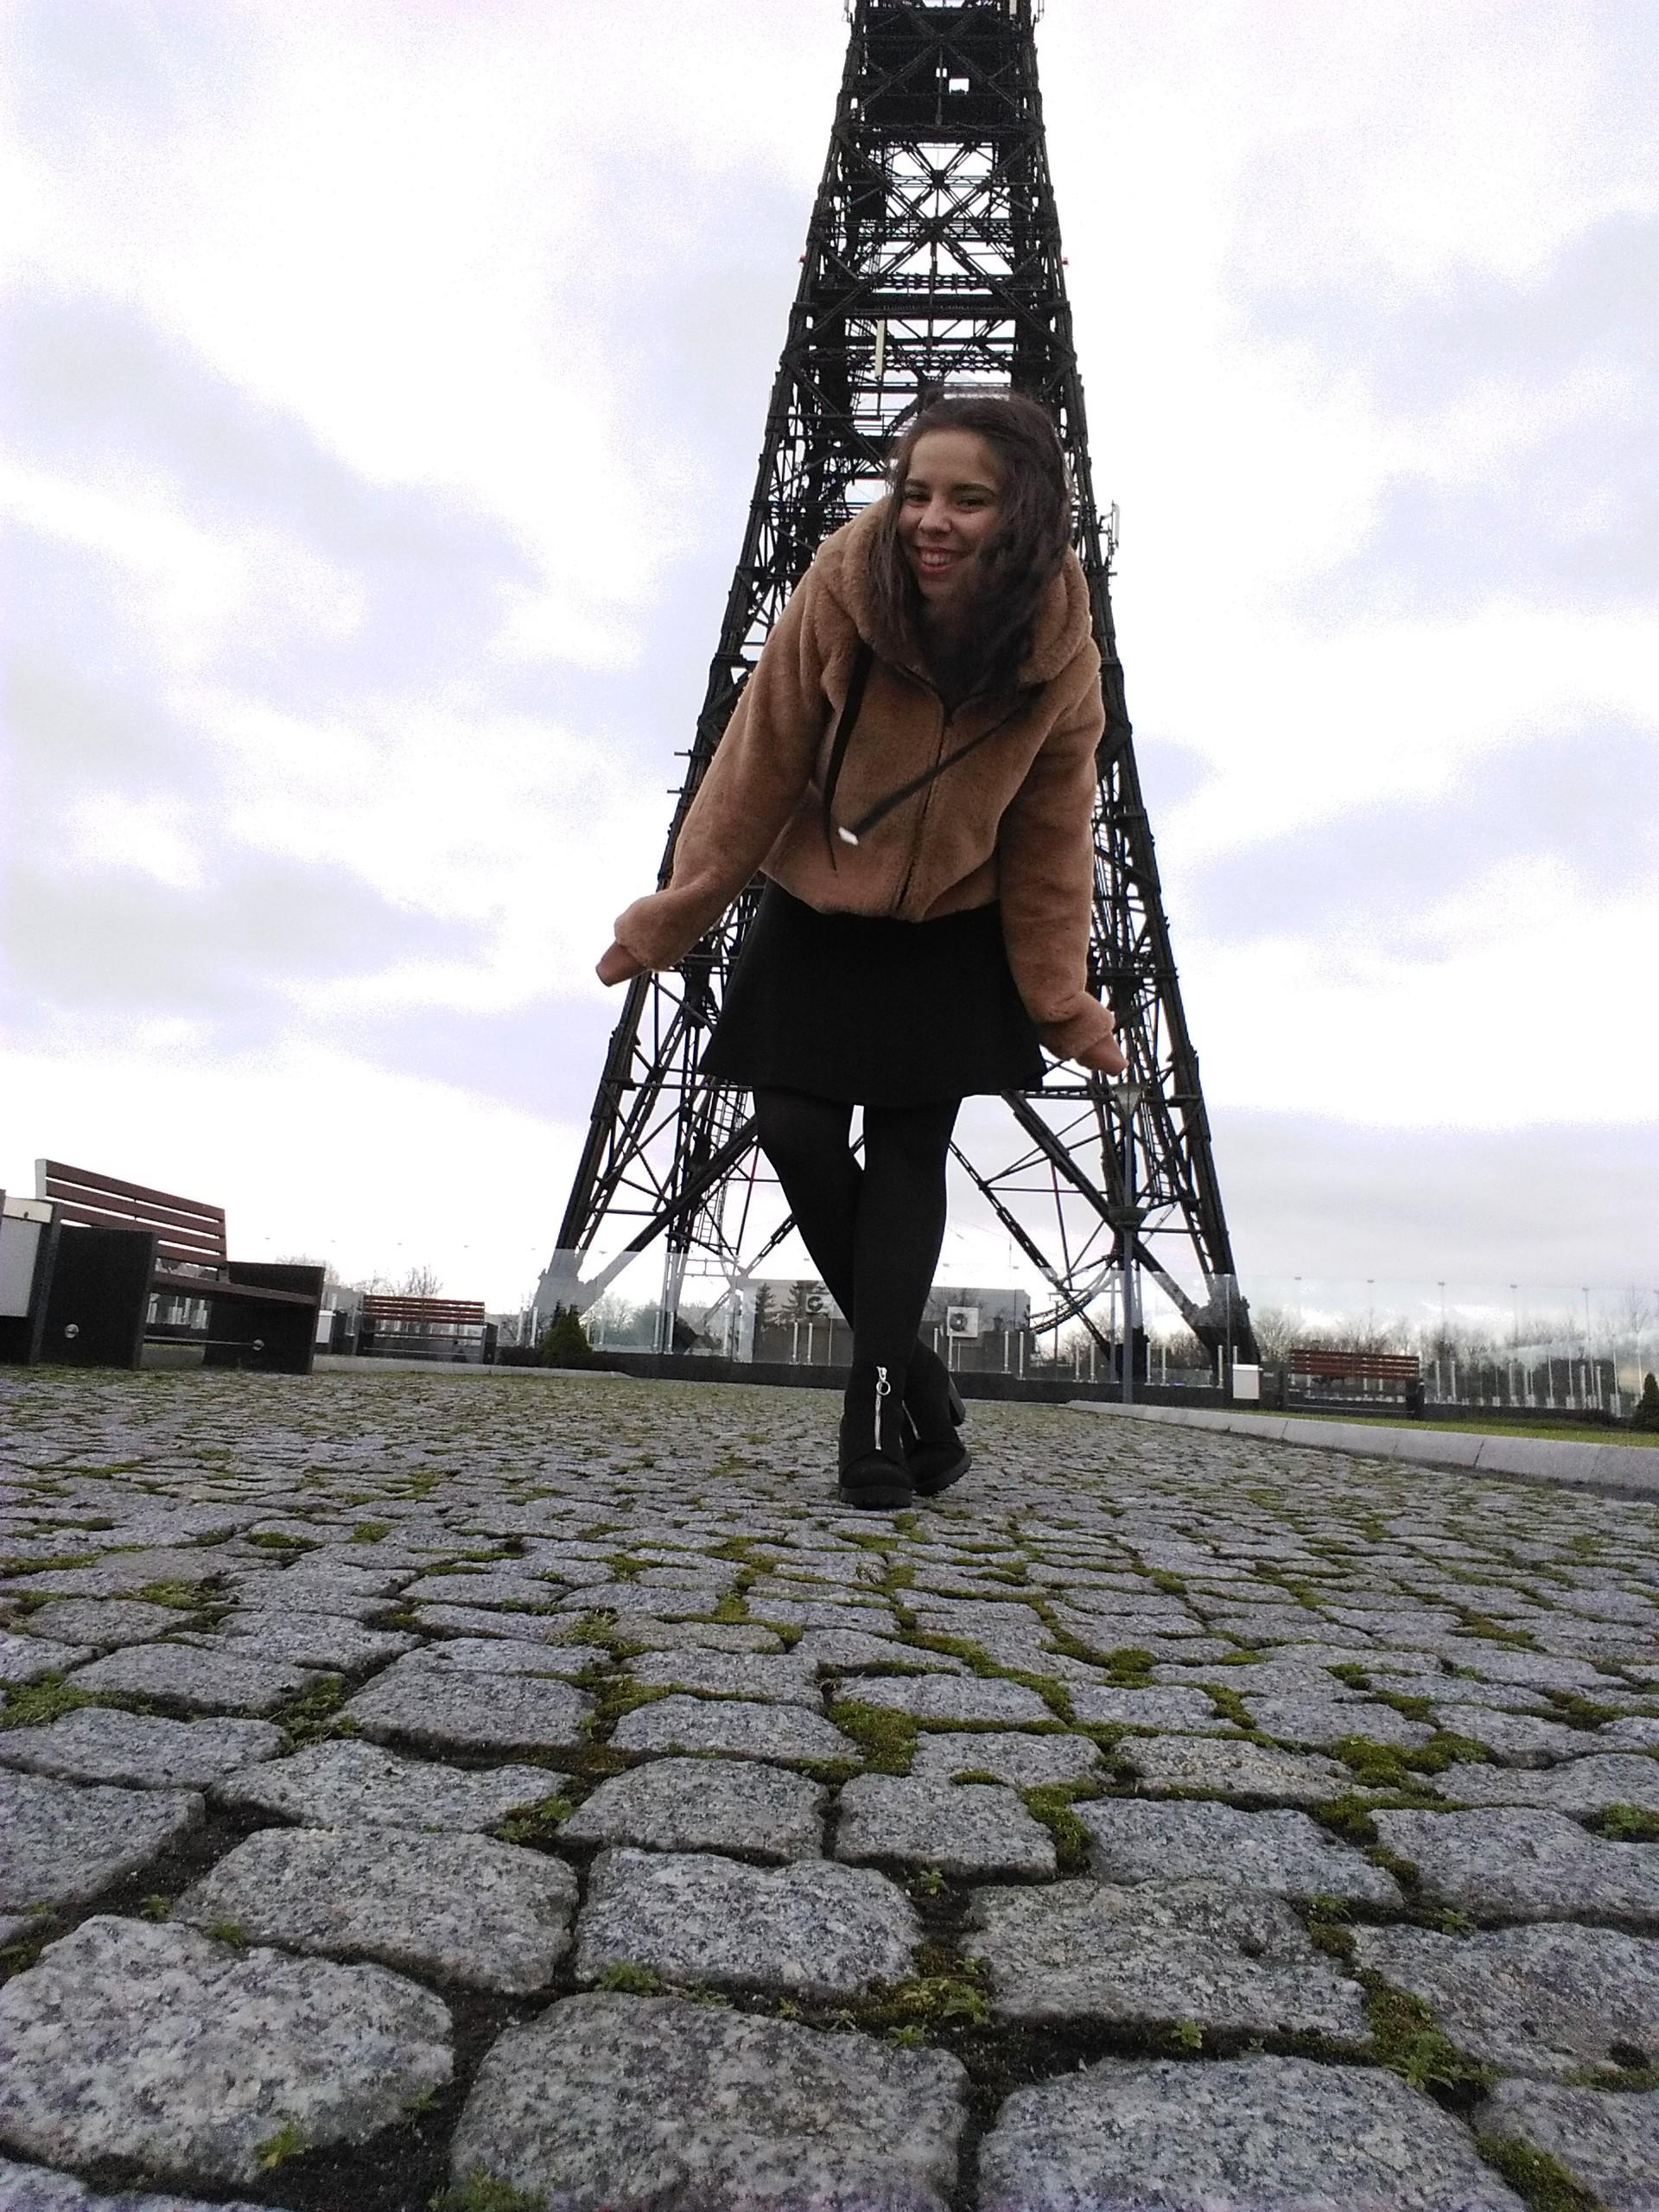 Wooden Eiffel Tower